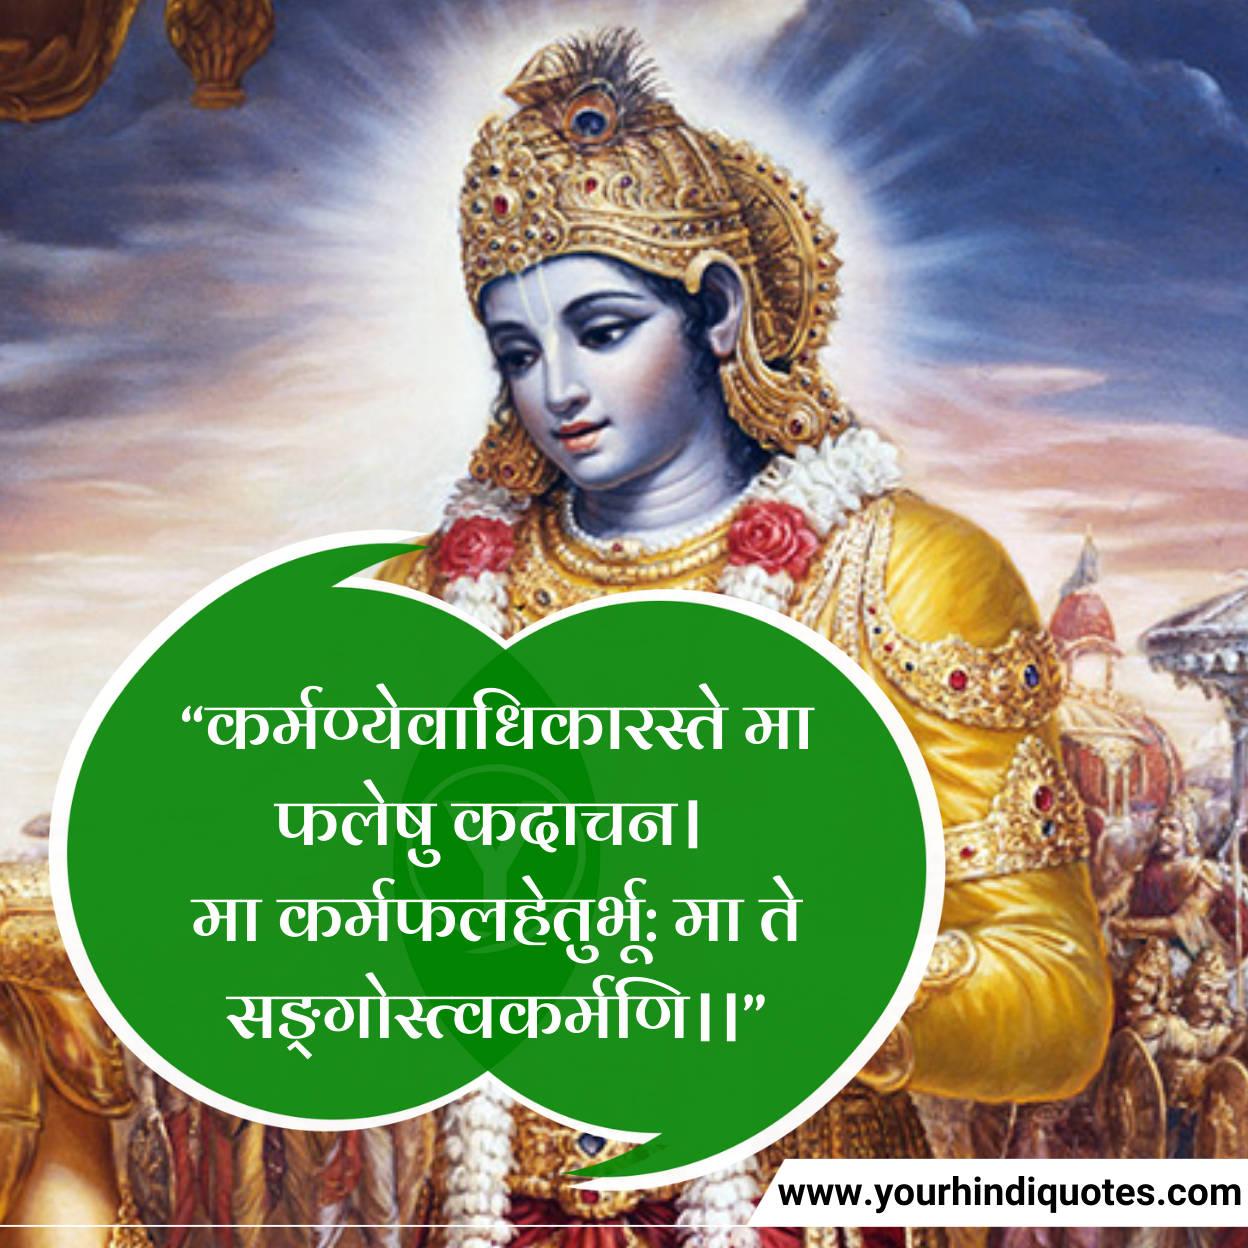 Krishna Geeta shlok in Hindi